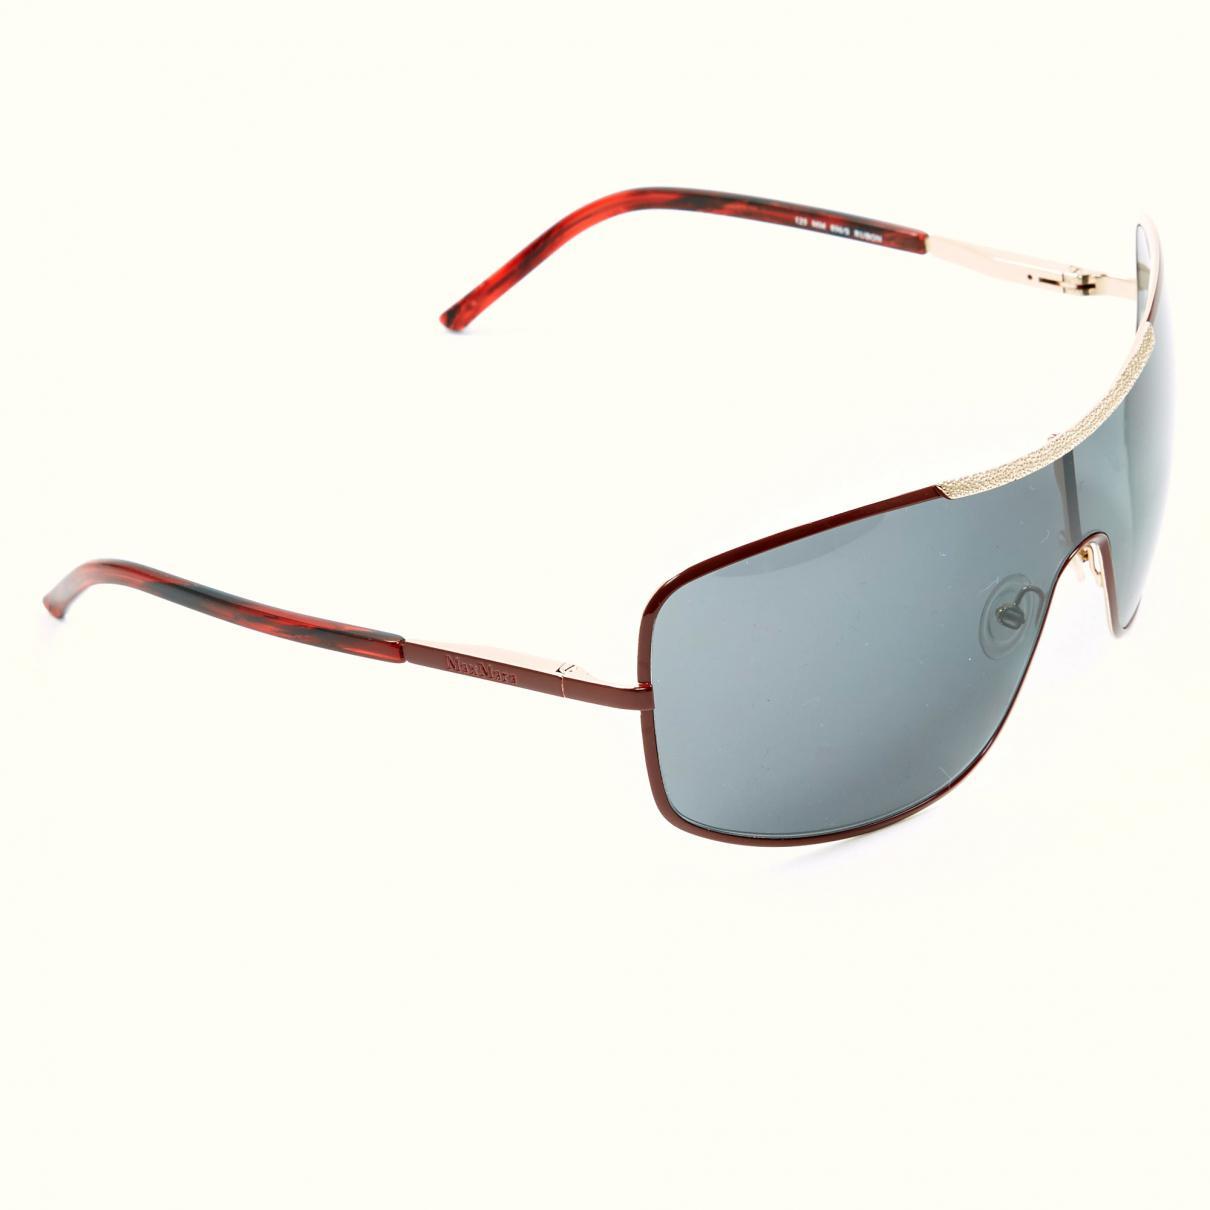 b2a6067f21de4 Max Mara Burgundy Metal Sunglasses - Lyst